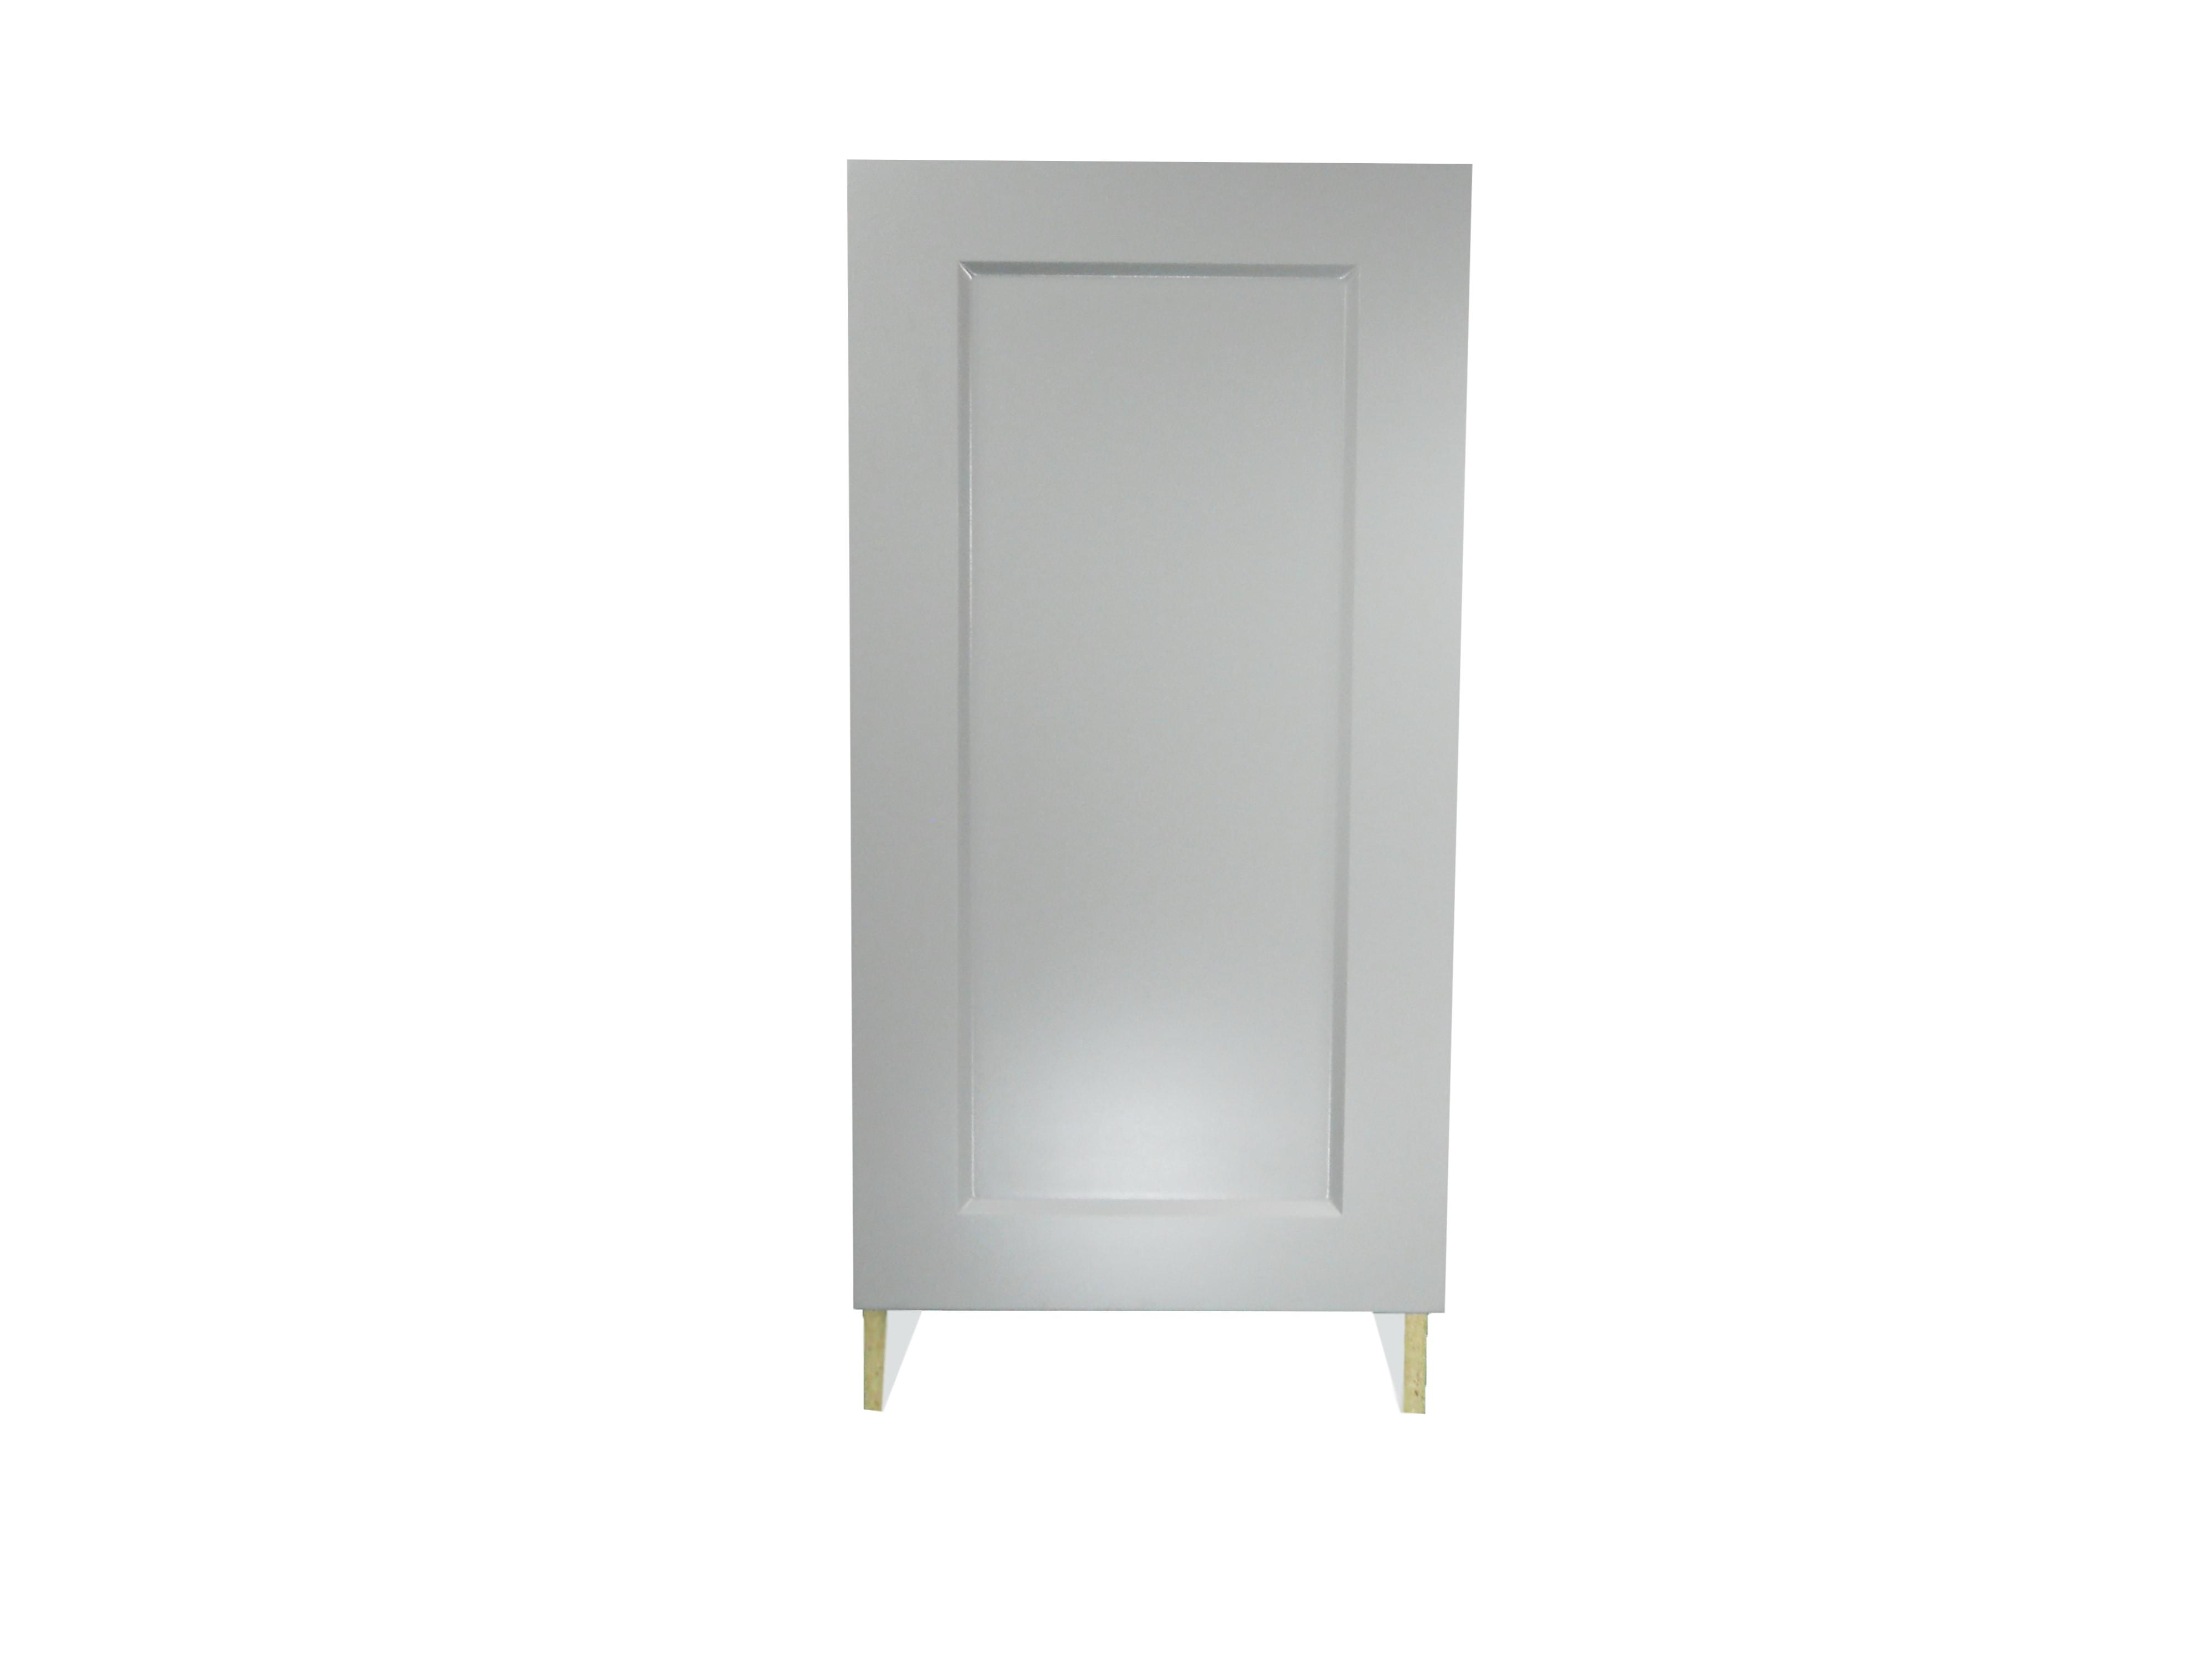 Base Cabinet With Door / Whistler Grey / Flat Panel Grey / 18 Whistler Grey 0